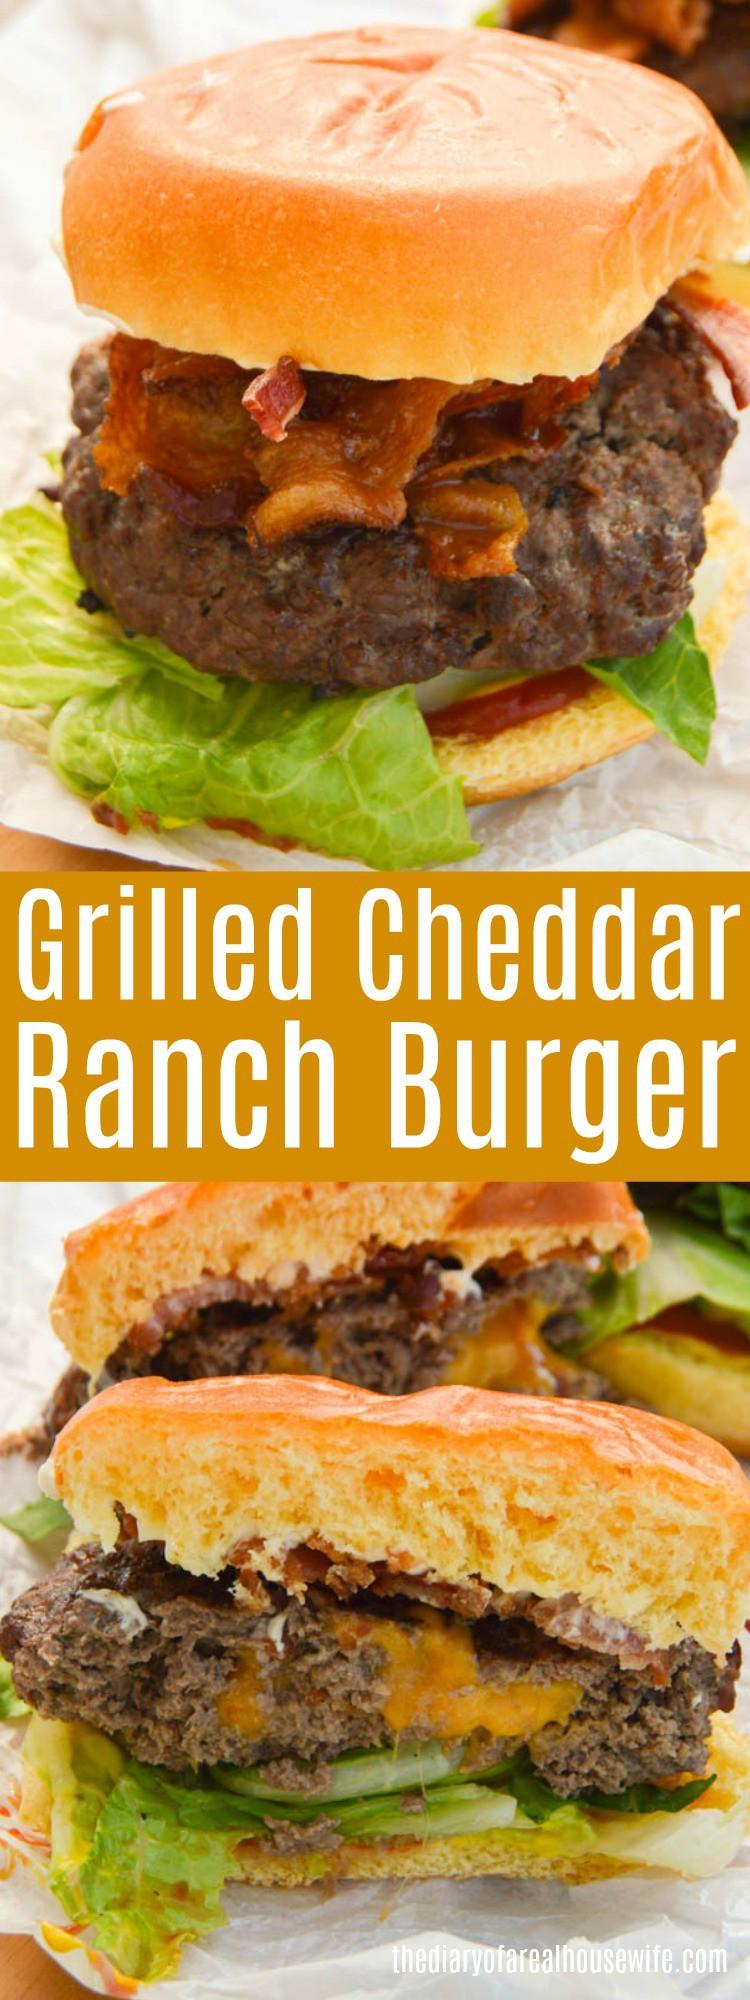 Cheddar Ranch Burger